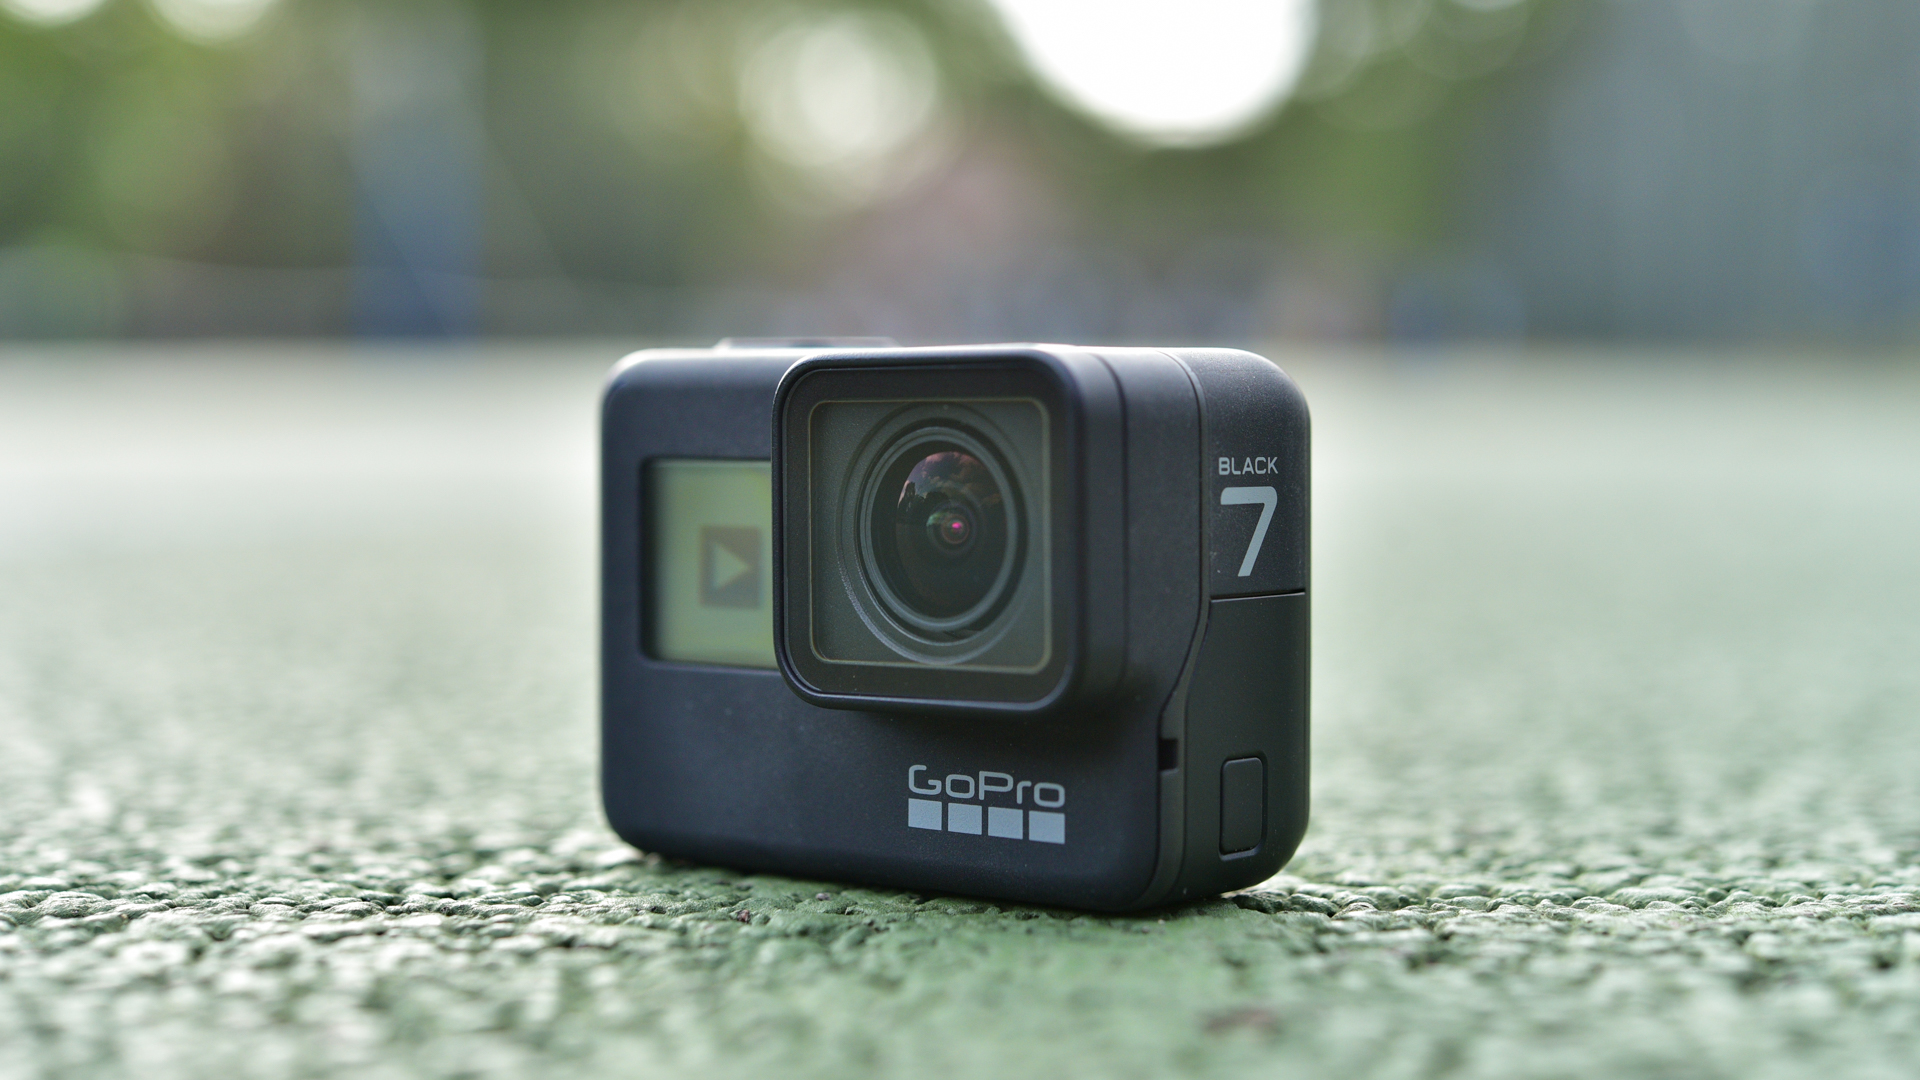 Best action cameras: GoPro Hero7 Black